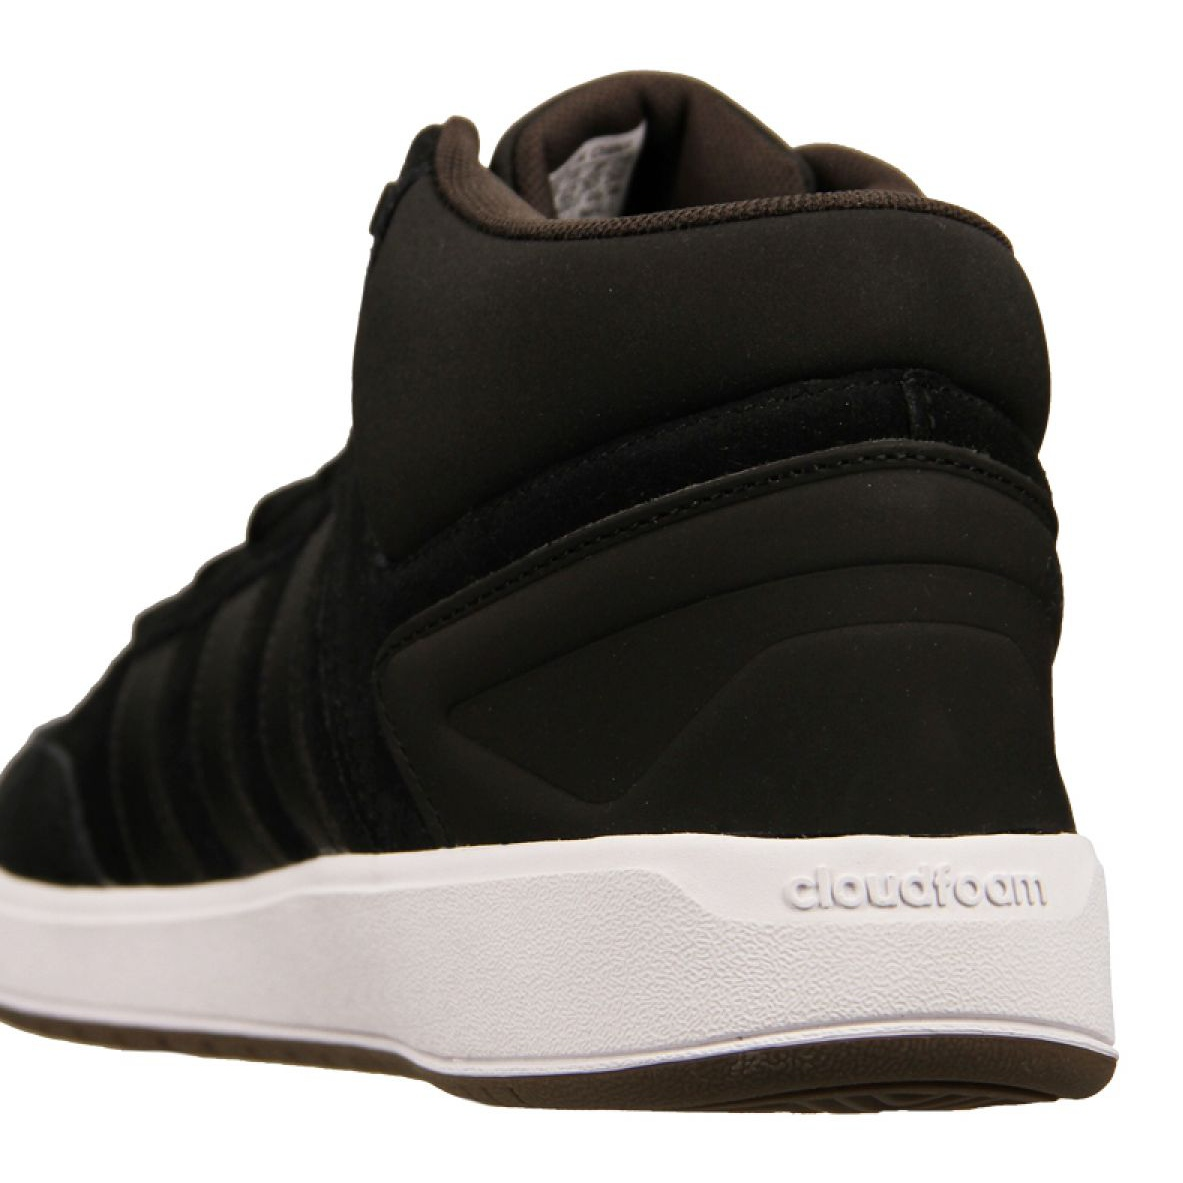 Adidas Cloudfoam All Court Mid M B43858 shoes black